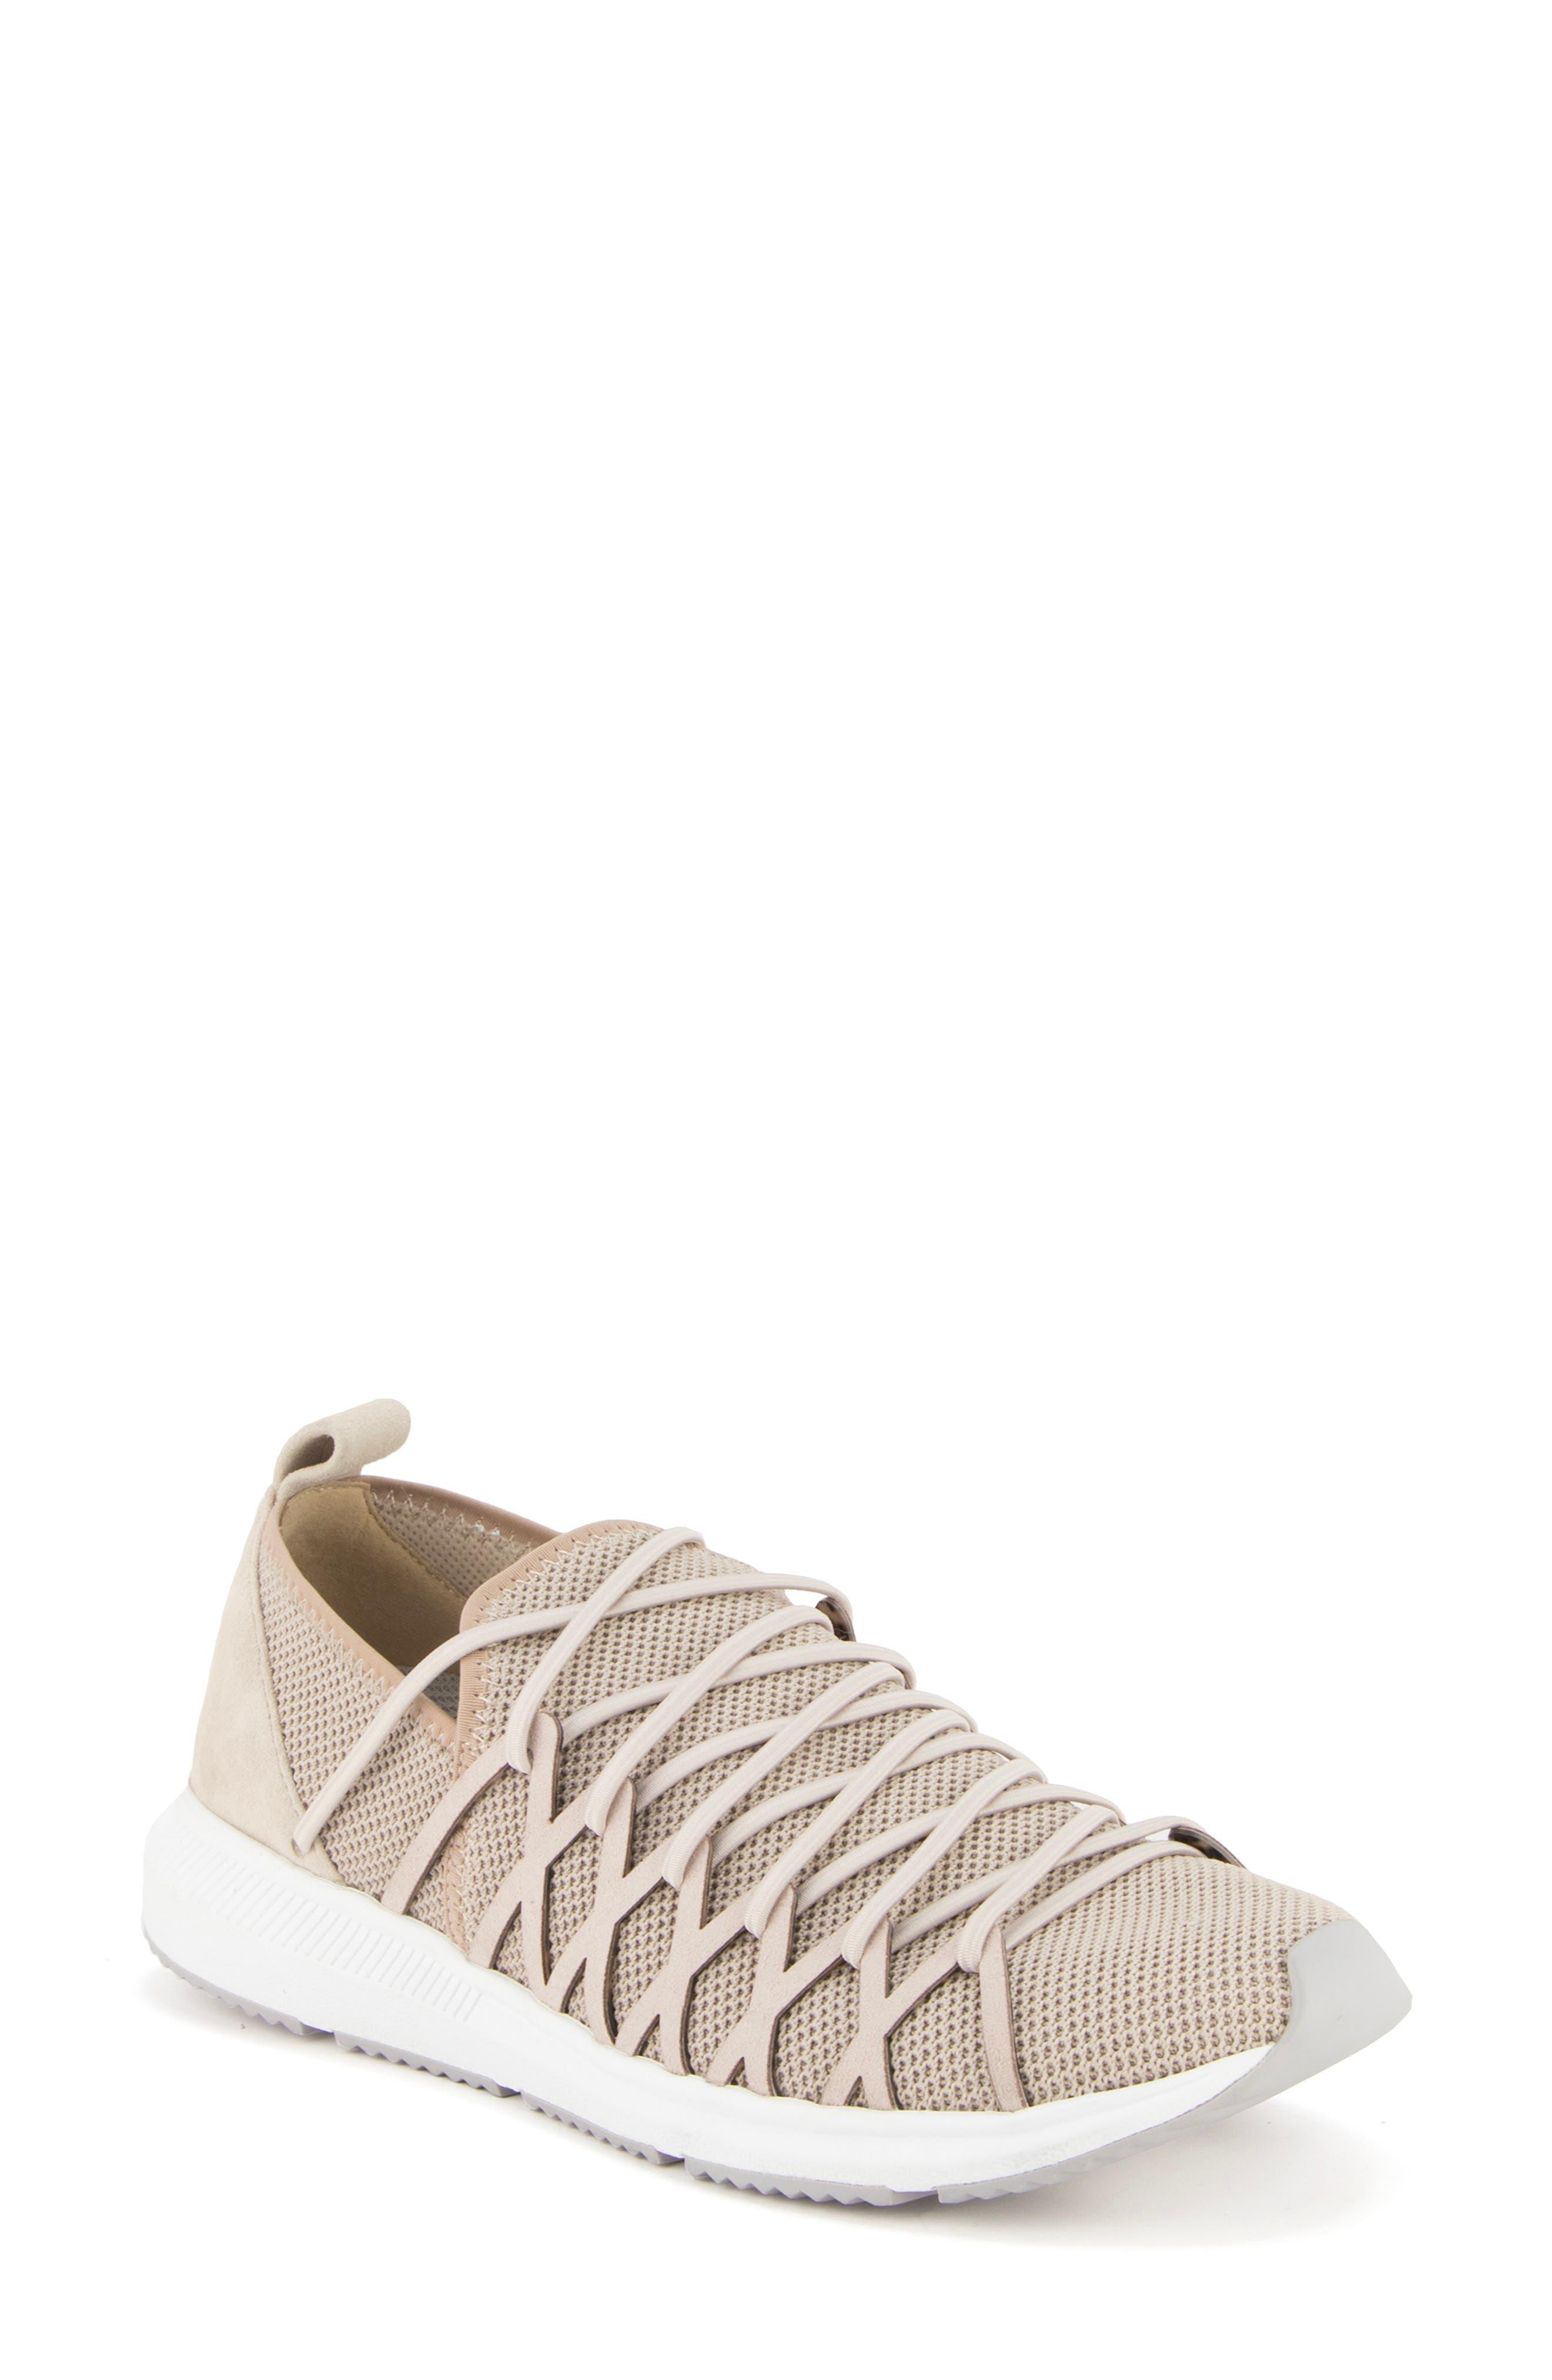 Image of Eileen Fisher Rumor Sneaker